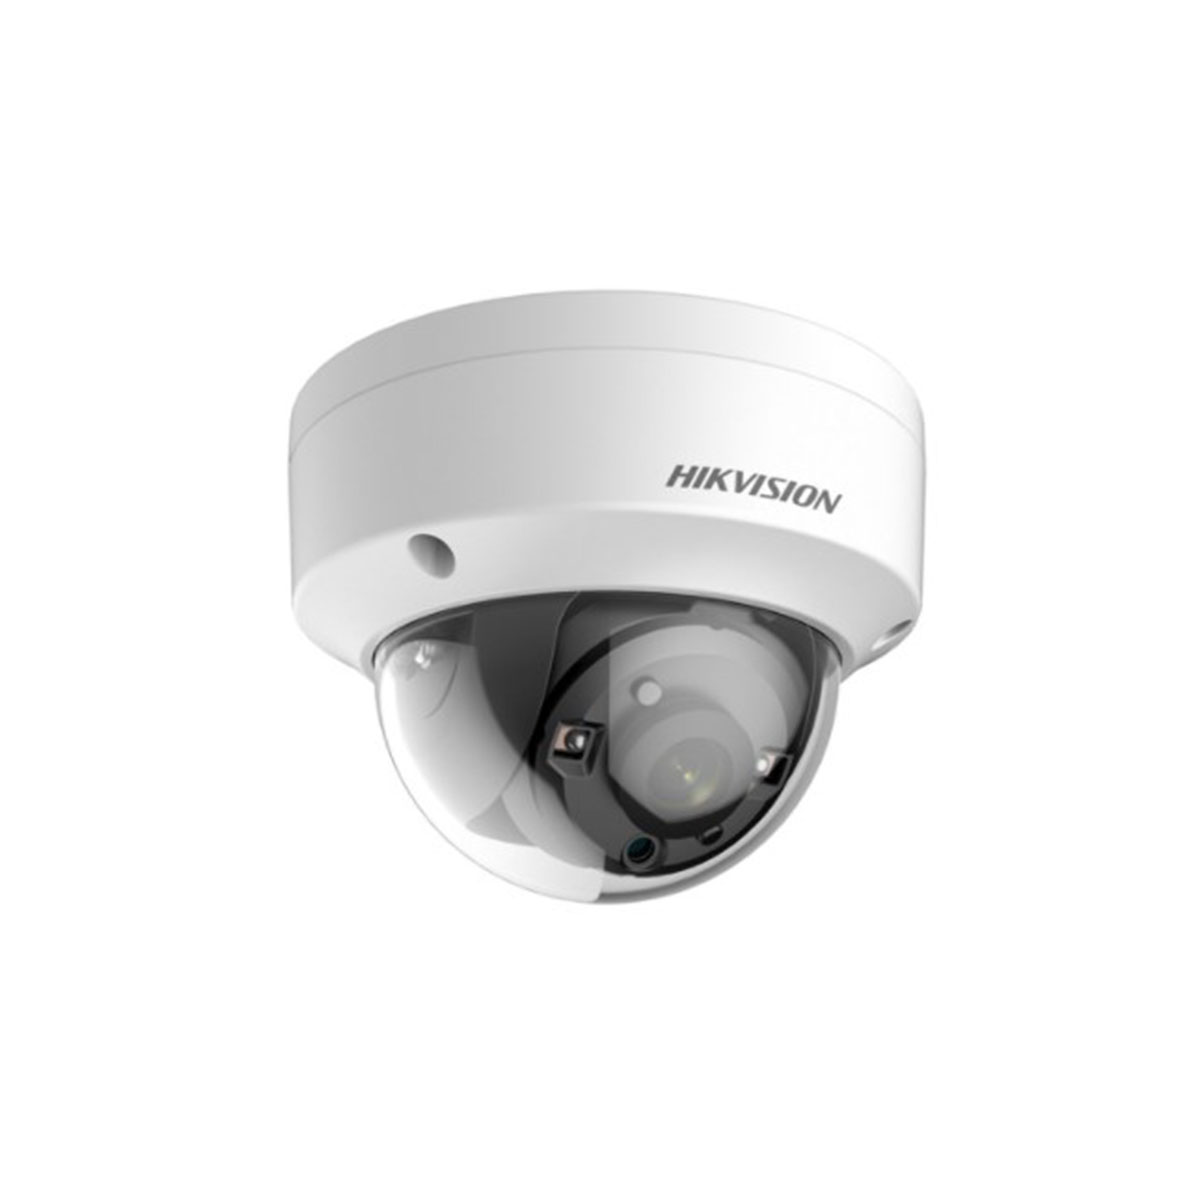 Cámara Hikvision DS-2CE56H0T-VPITF 5MP Tipo Domo